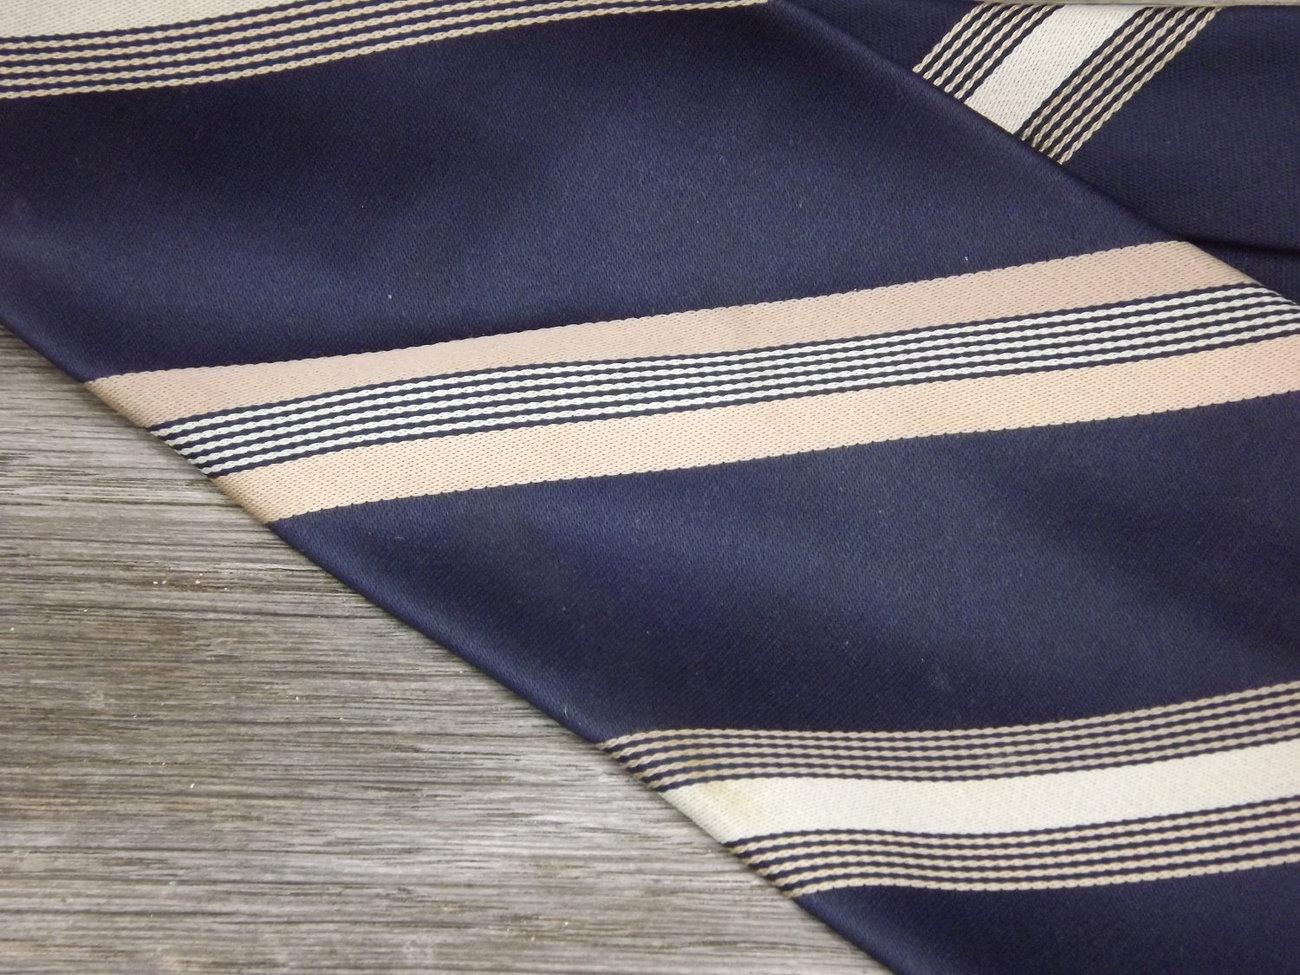 Vintage Tie / Designer Don Loper Beverly Hills Necktie / Navy Blue, Gold, and Kh